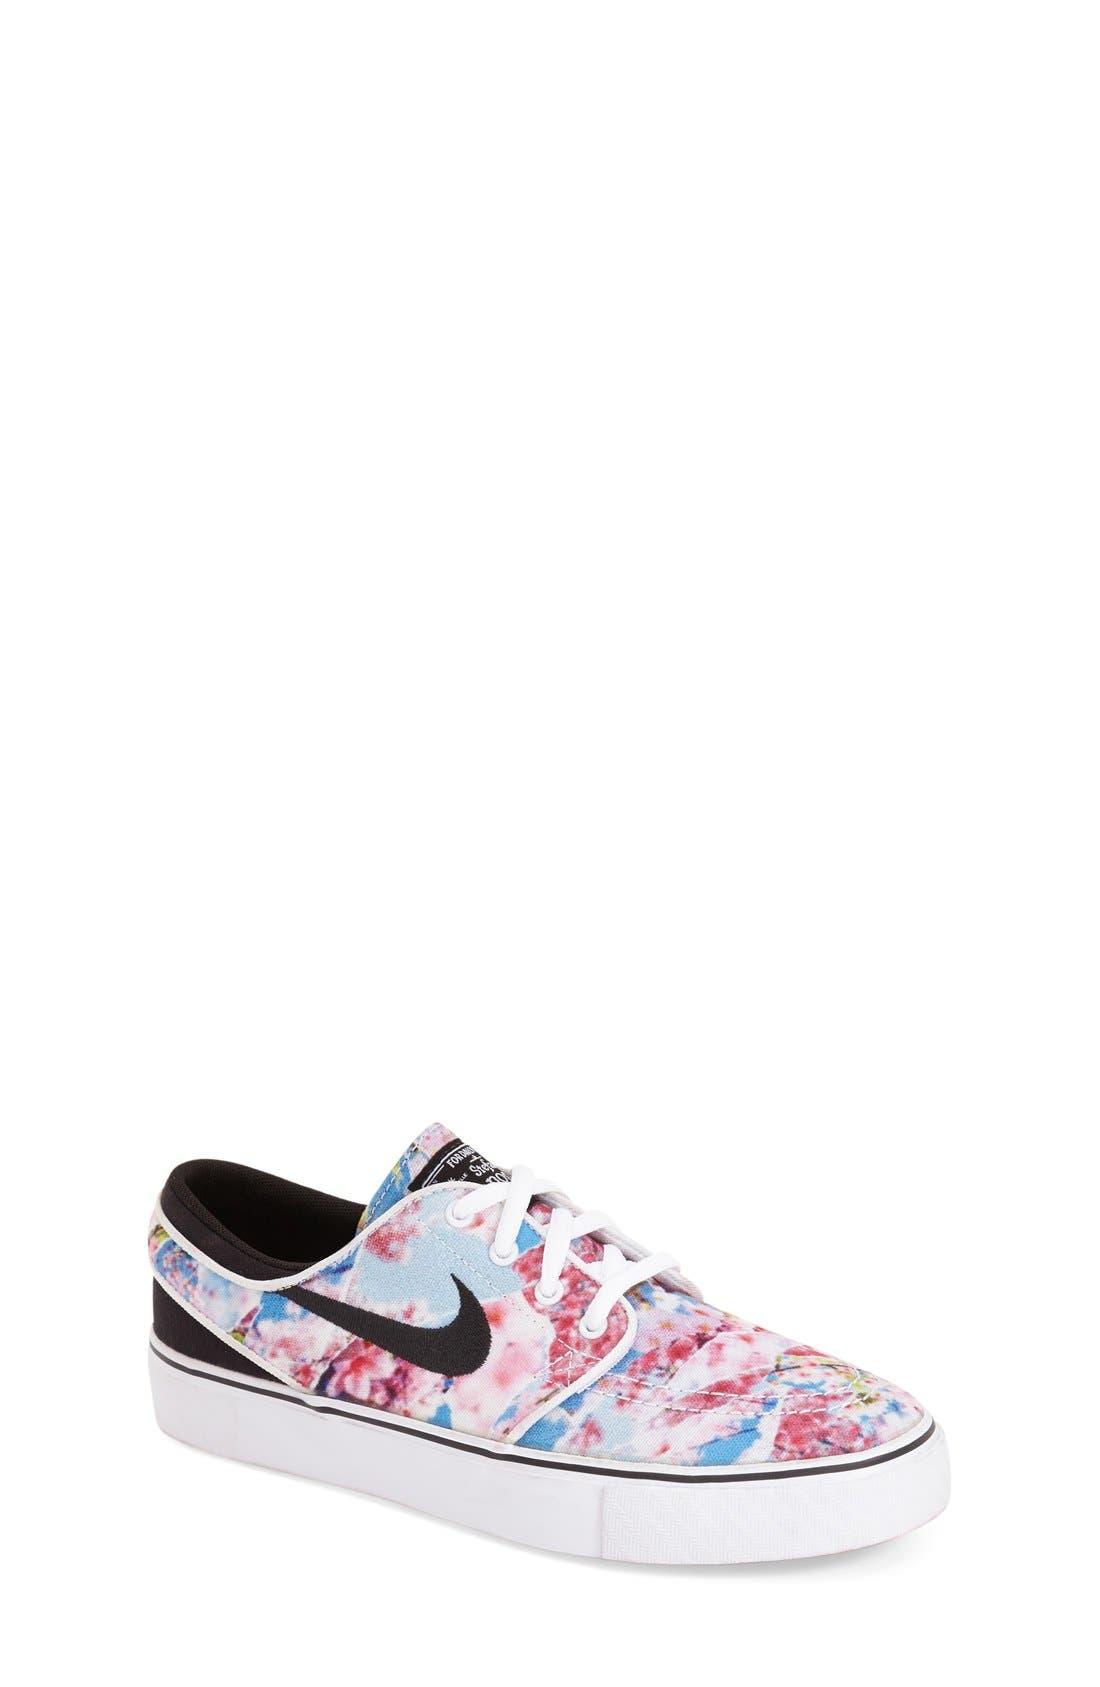 Main Image - Nike 'Stefan Janoski' Premium Canvas Sneaker (Big Kid)